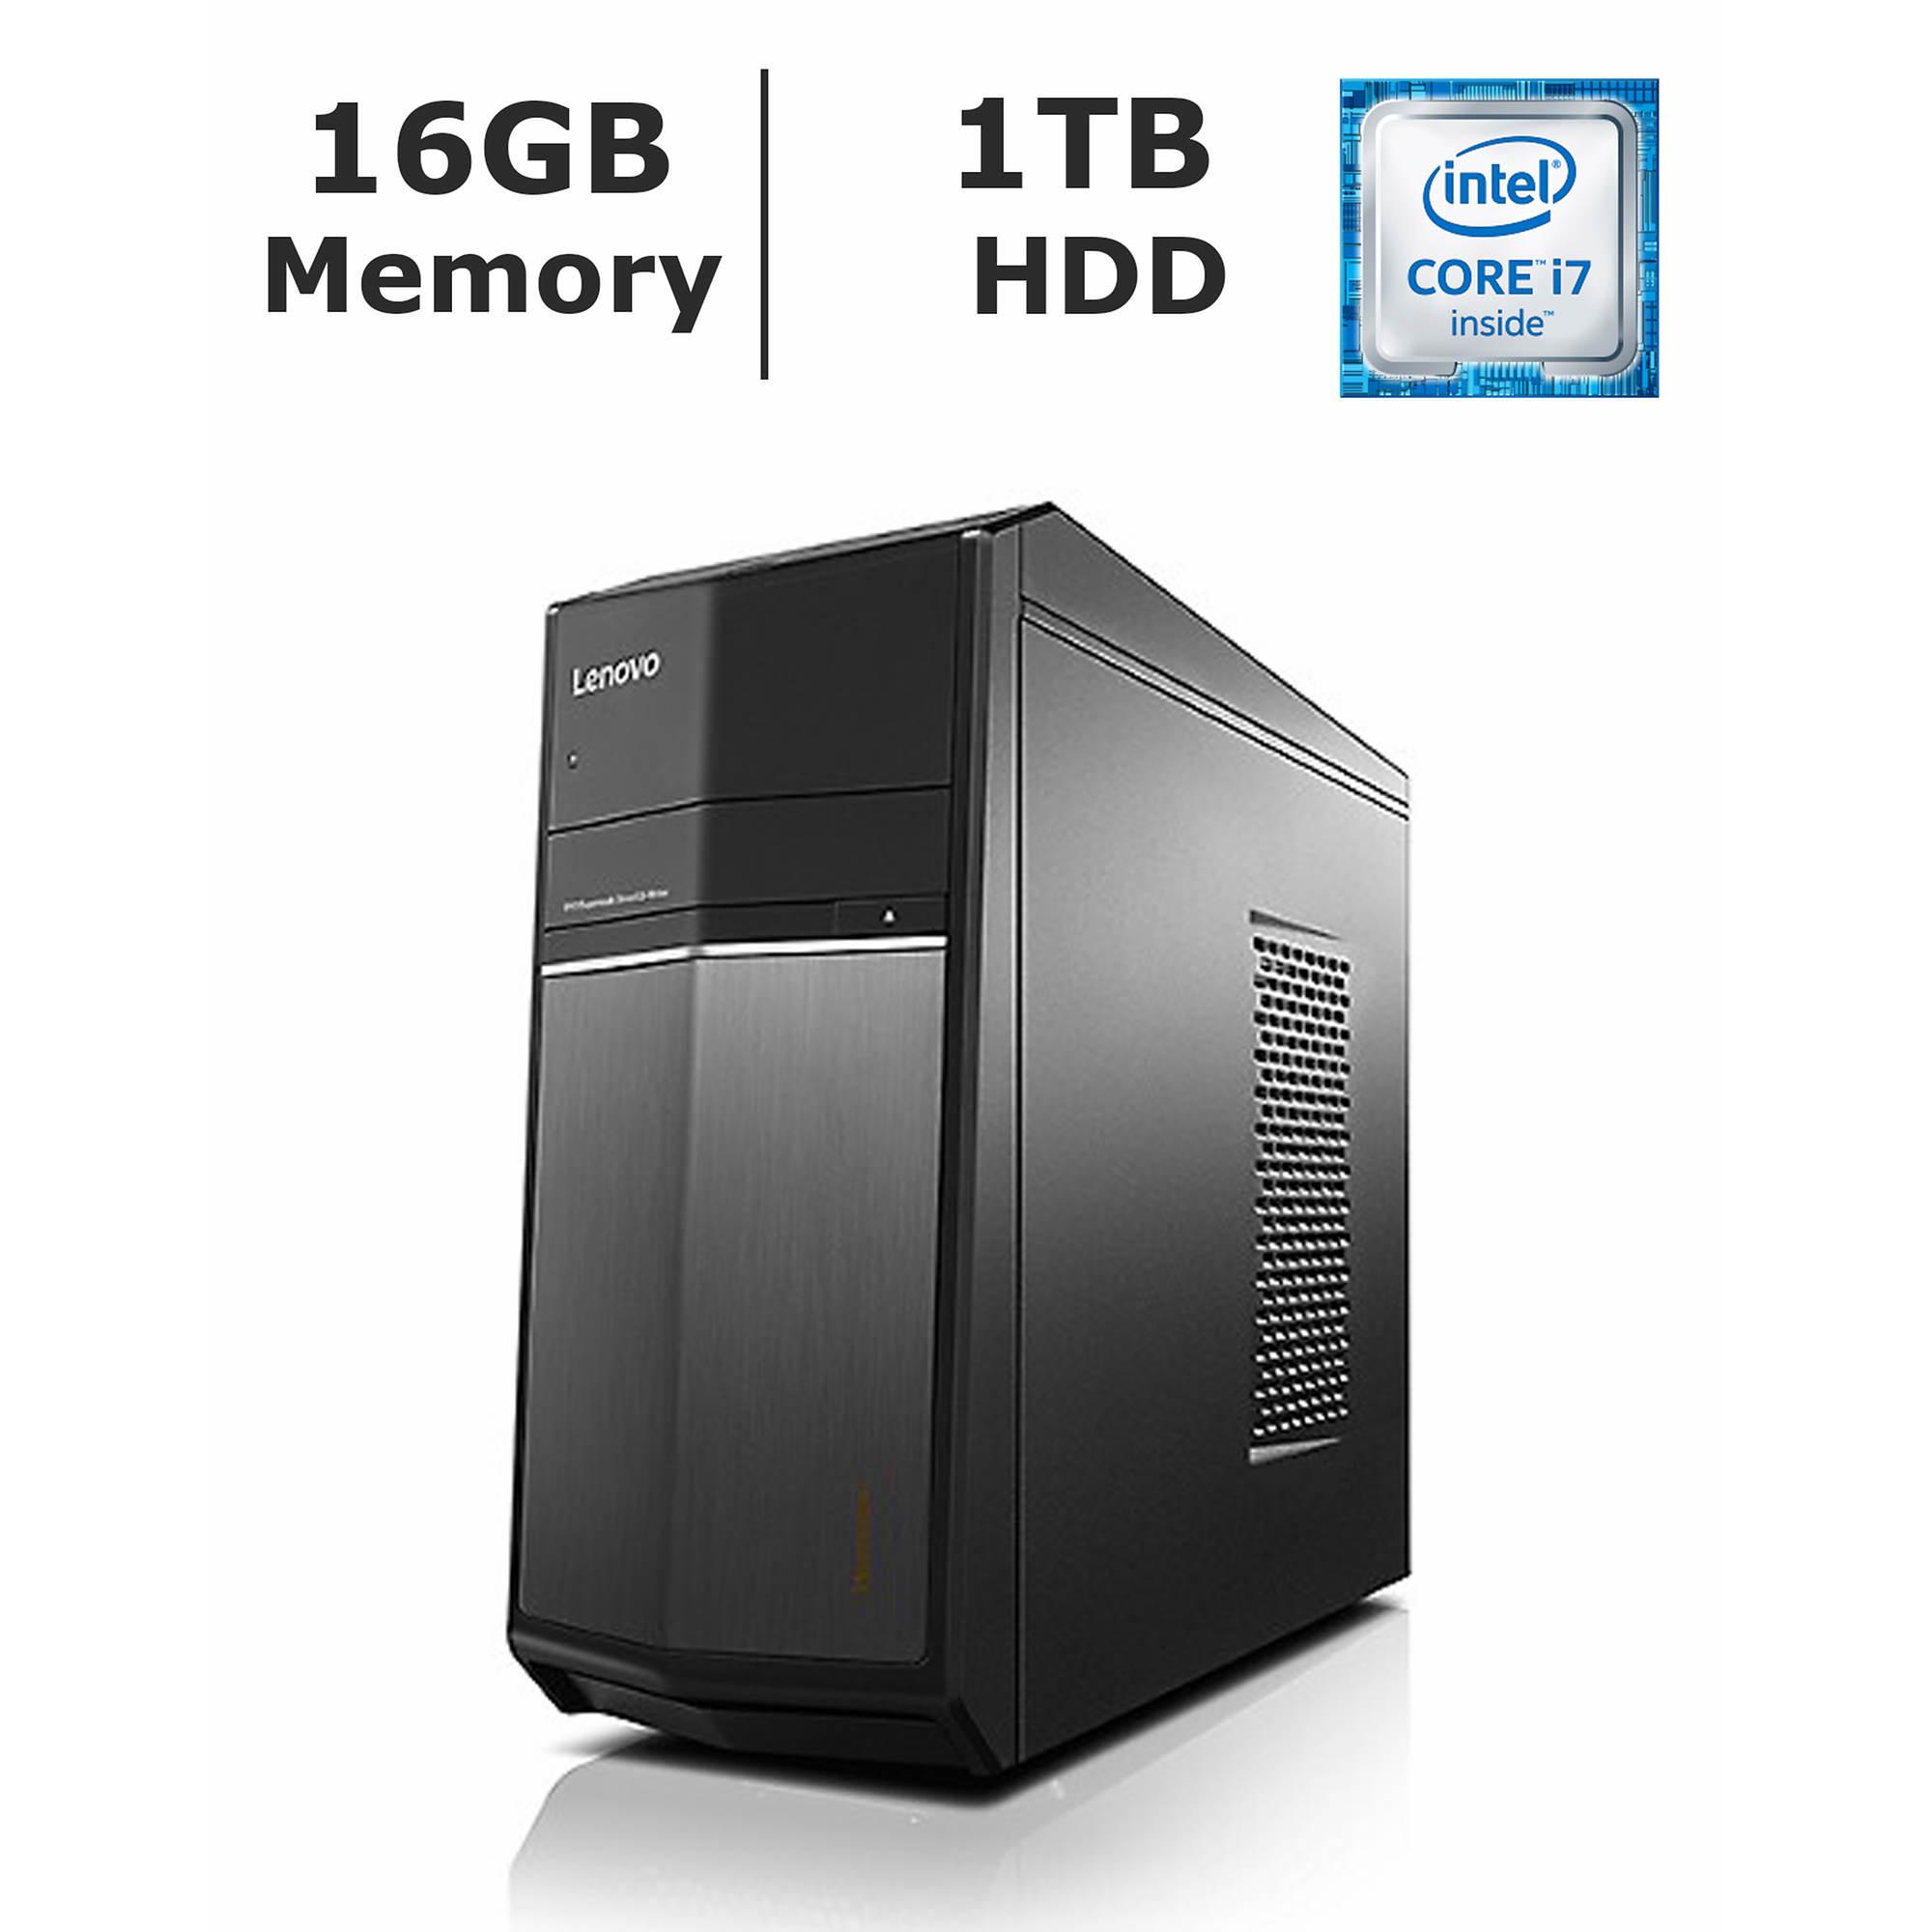 Lenovo IdeaCentre 710 Desktop, Intel Core i7, 16GB Memory, 1TB Hard Drive, 2GB Graphics